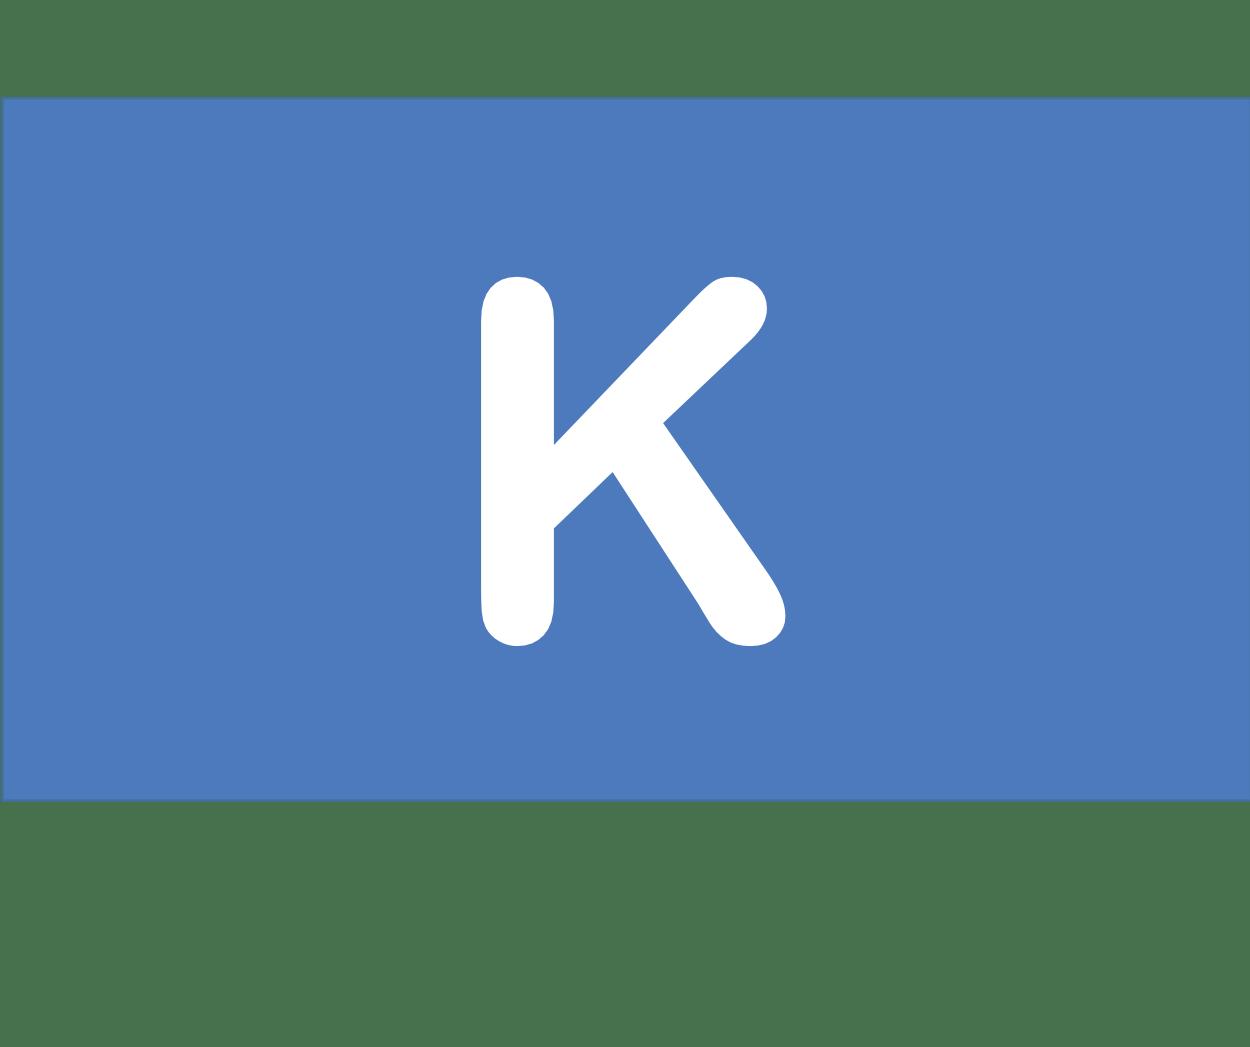 19 K カリウム Potassium 元素 記号 周期表 化学 原子